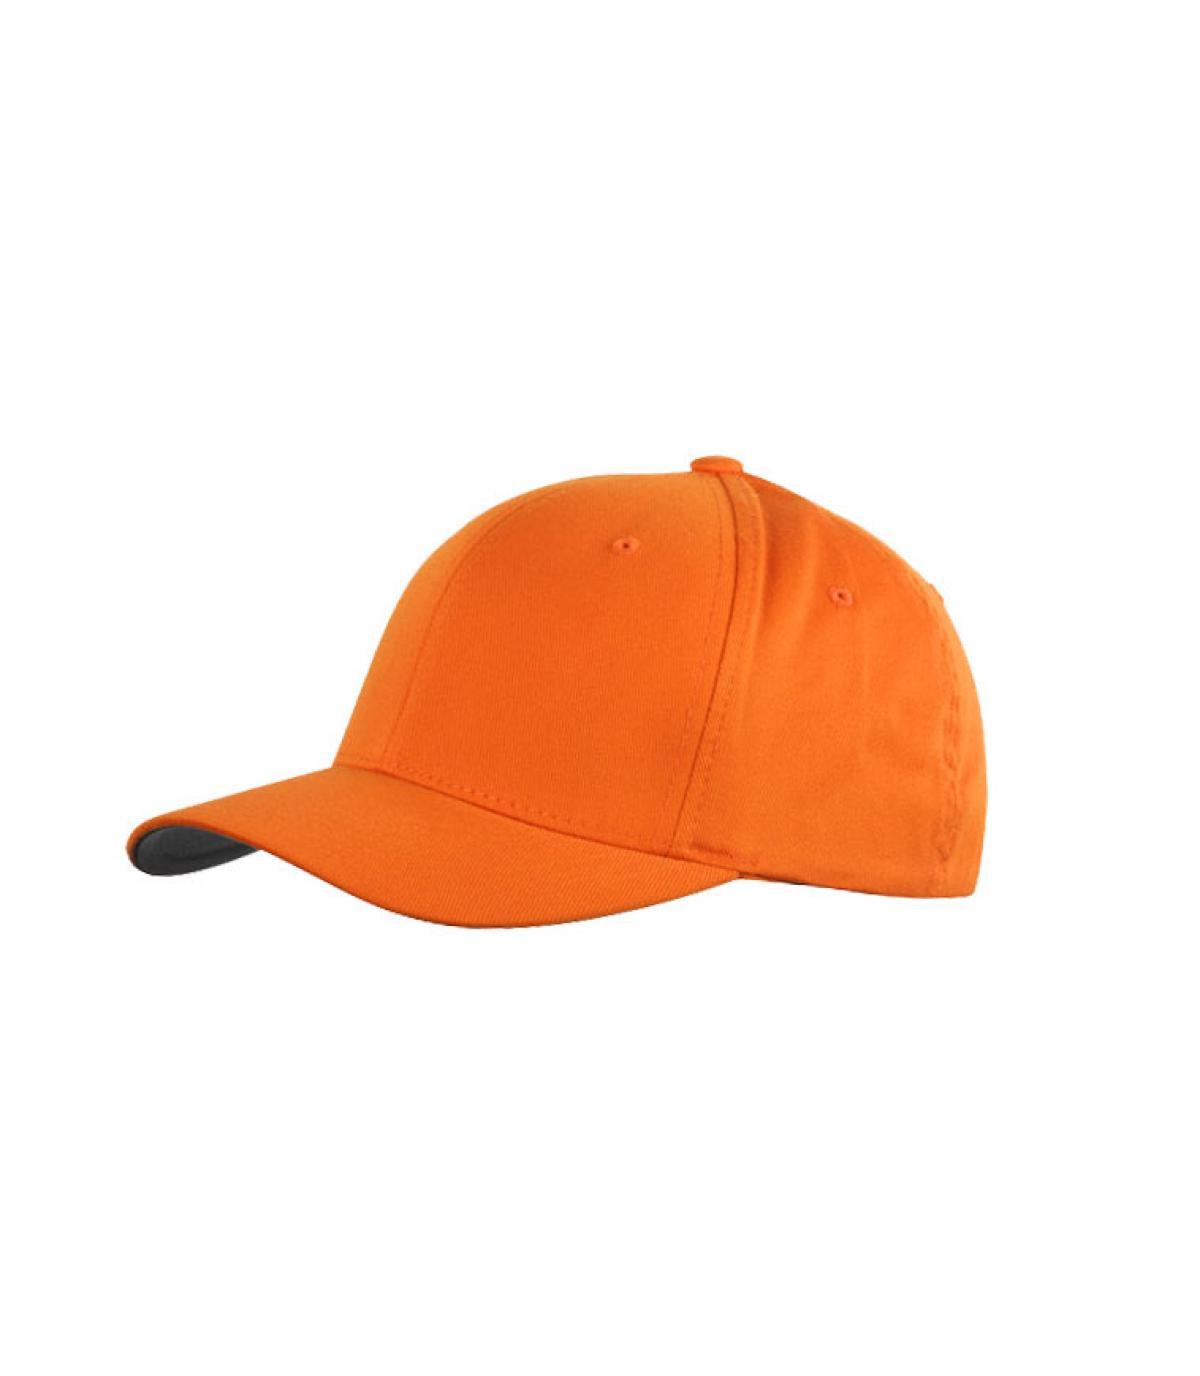 Detalles Flexfit cap orange imagen 2